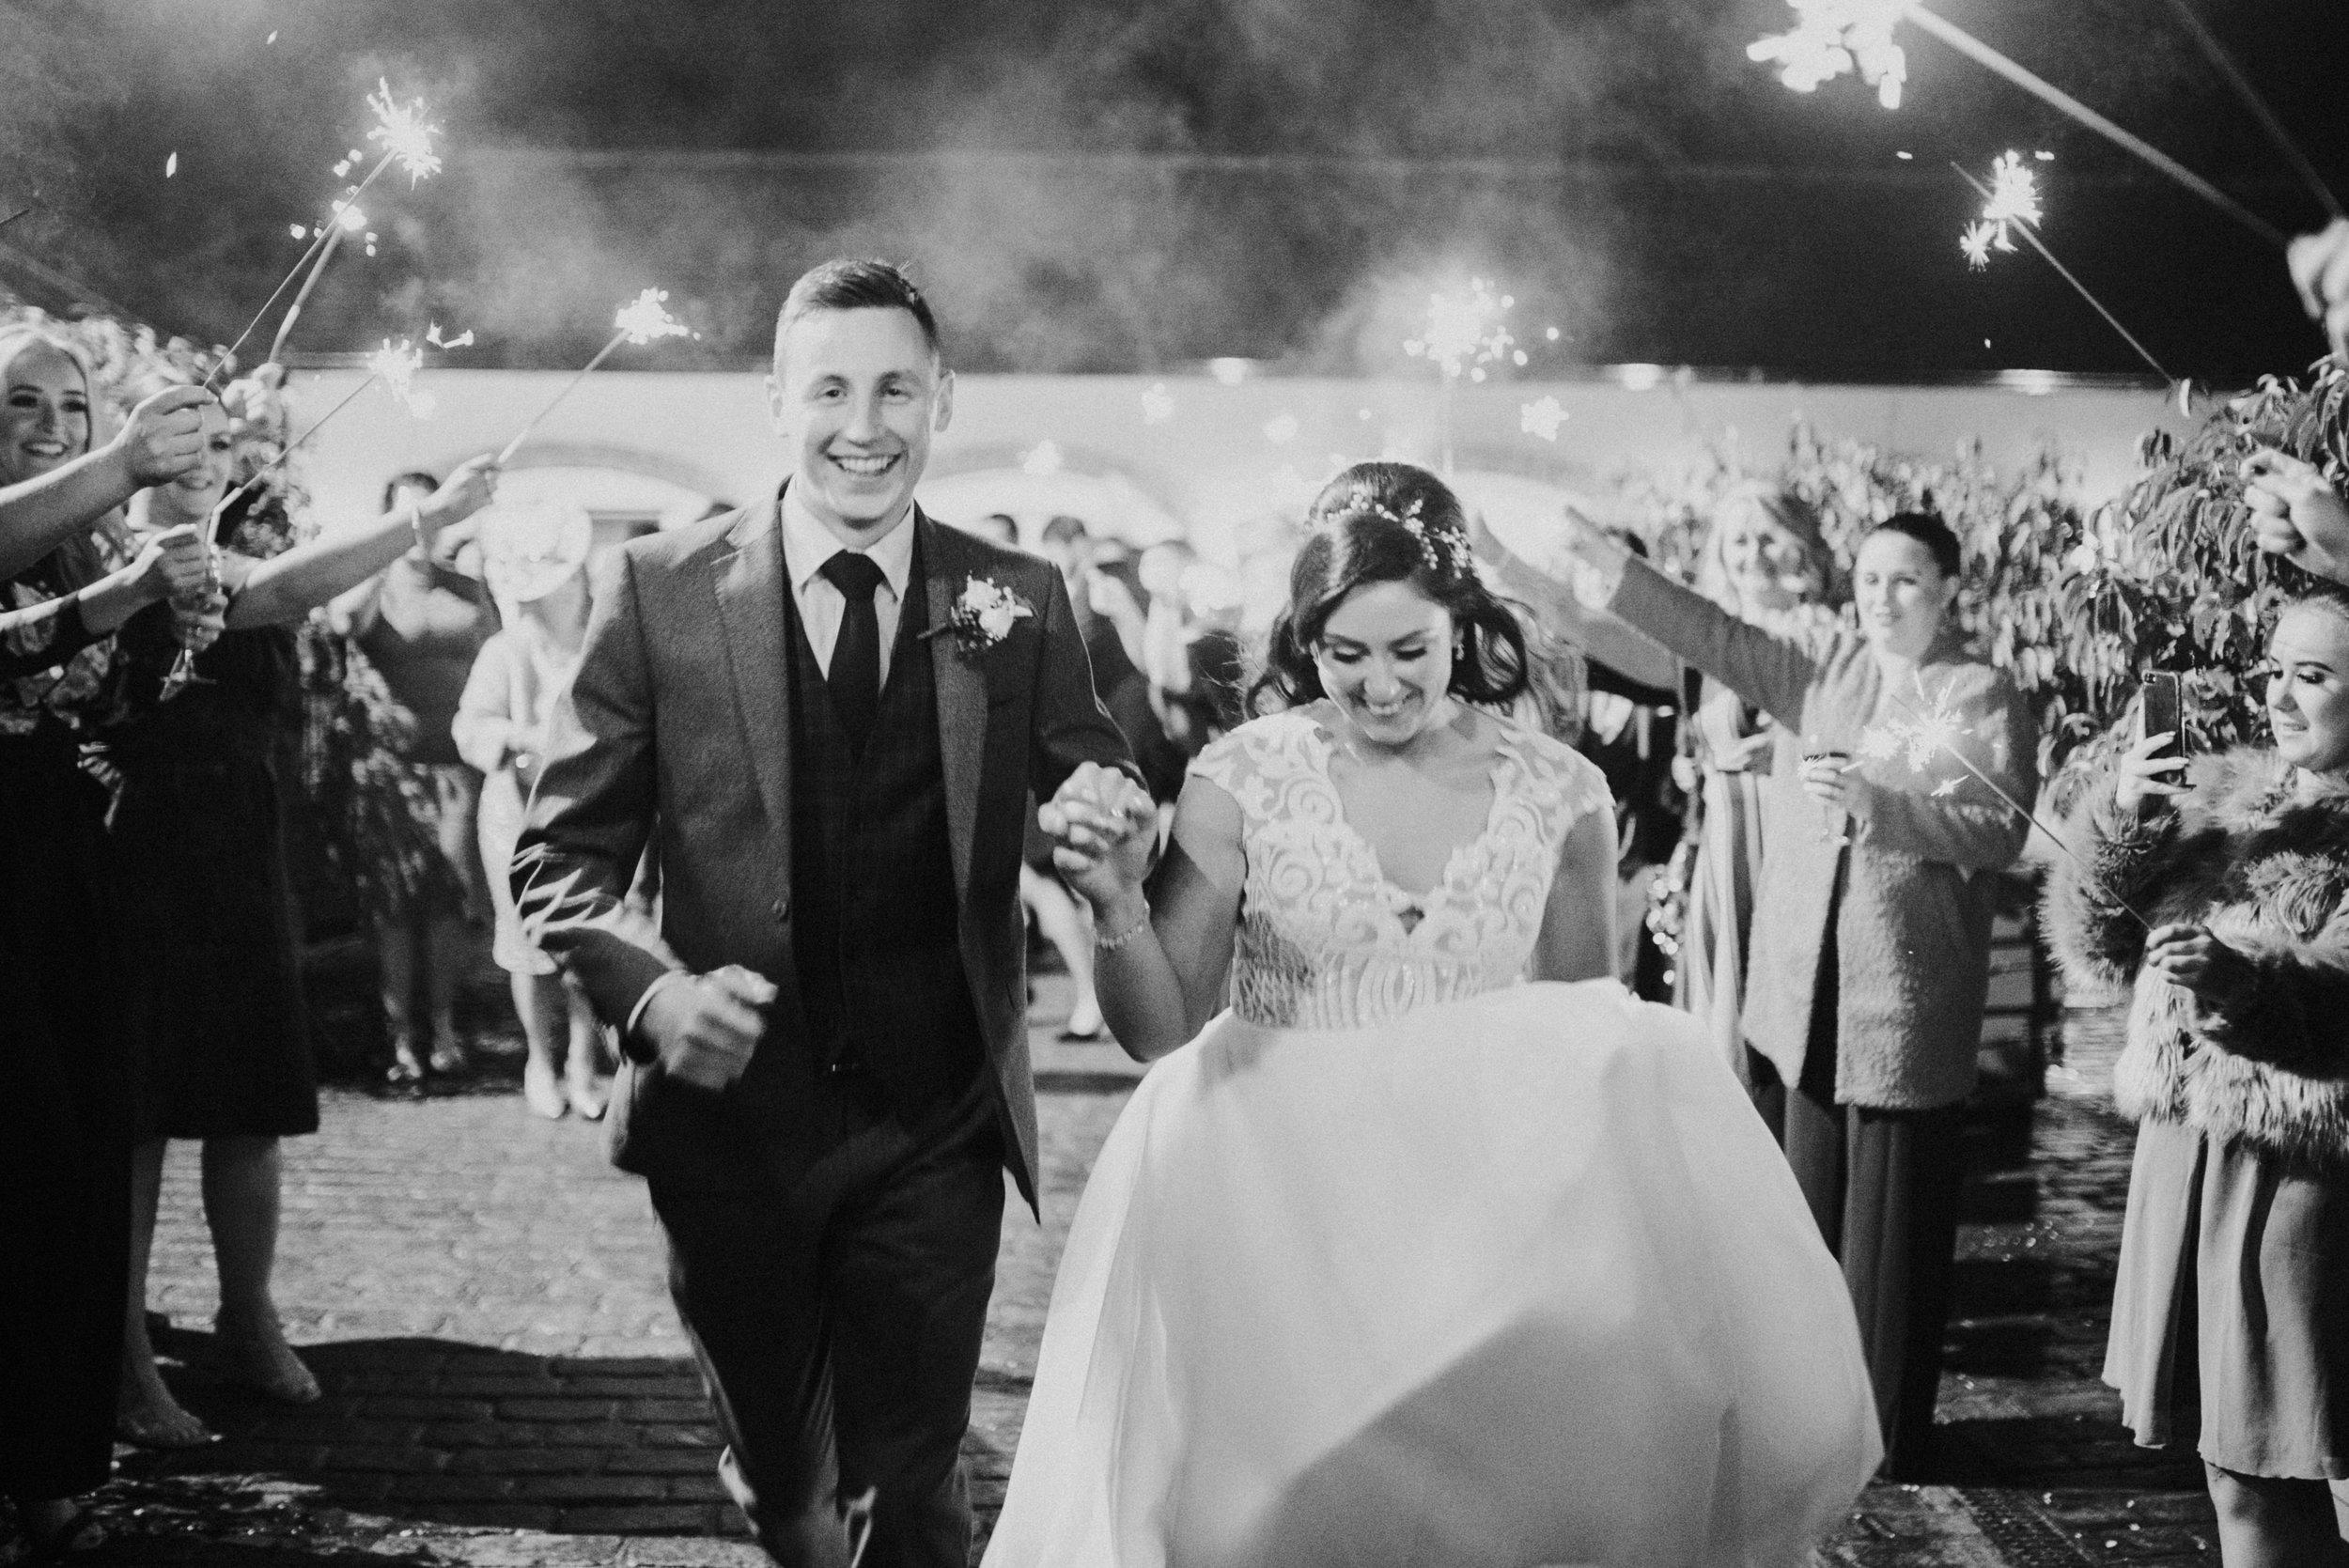 larchfield estate wedding, wedding venues northern ireland, barn wedding venues northern ireland, wedding photos larchfield estate, shane todd wedding, wedding sparklers, irish wedding (1).jpg